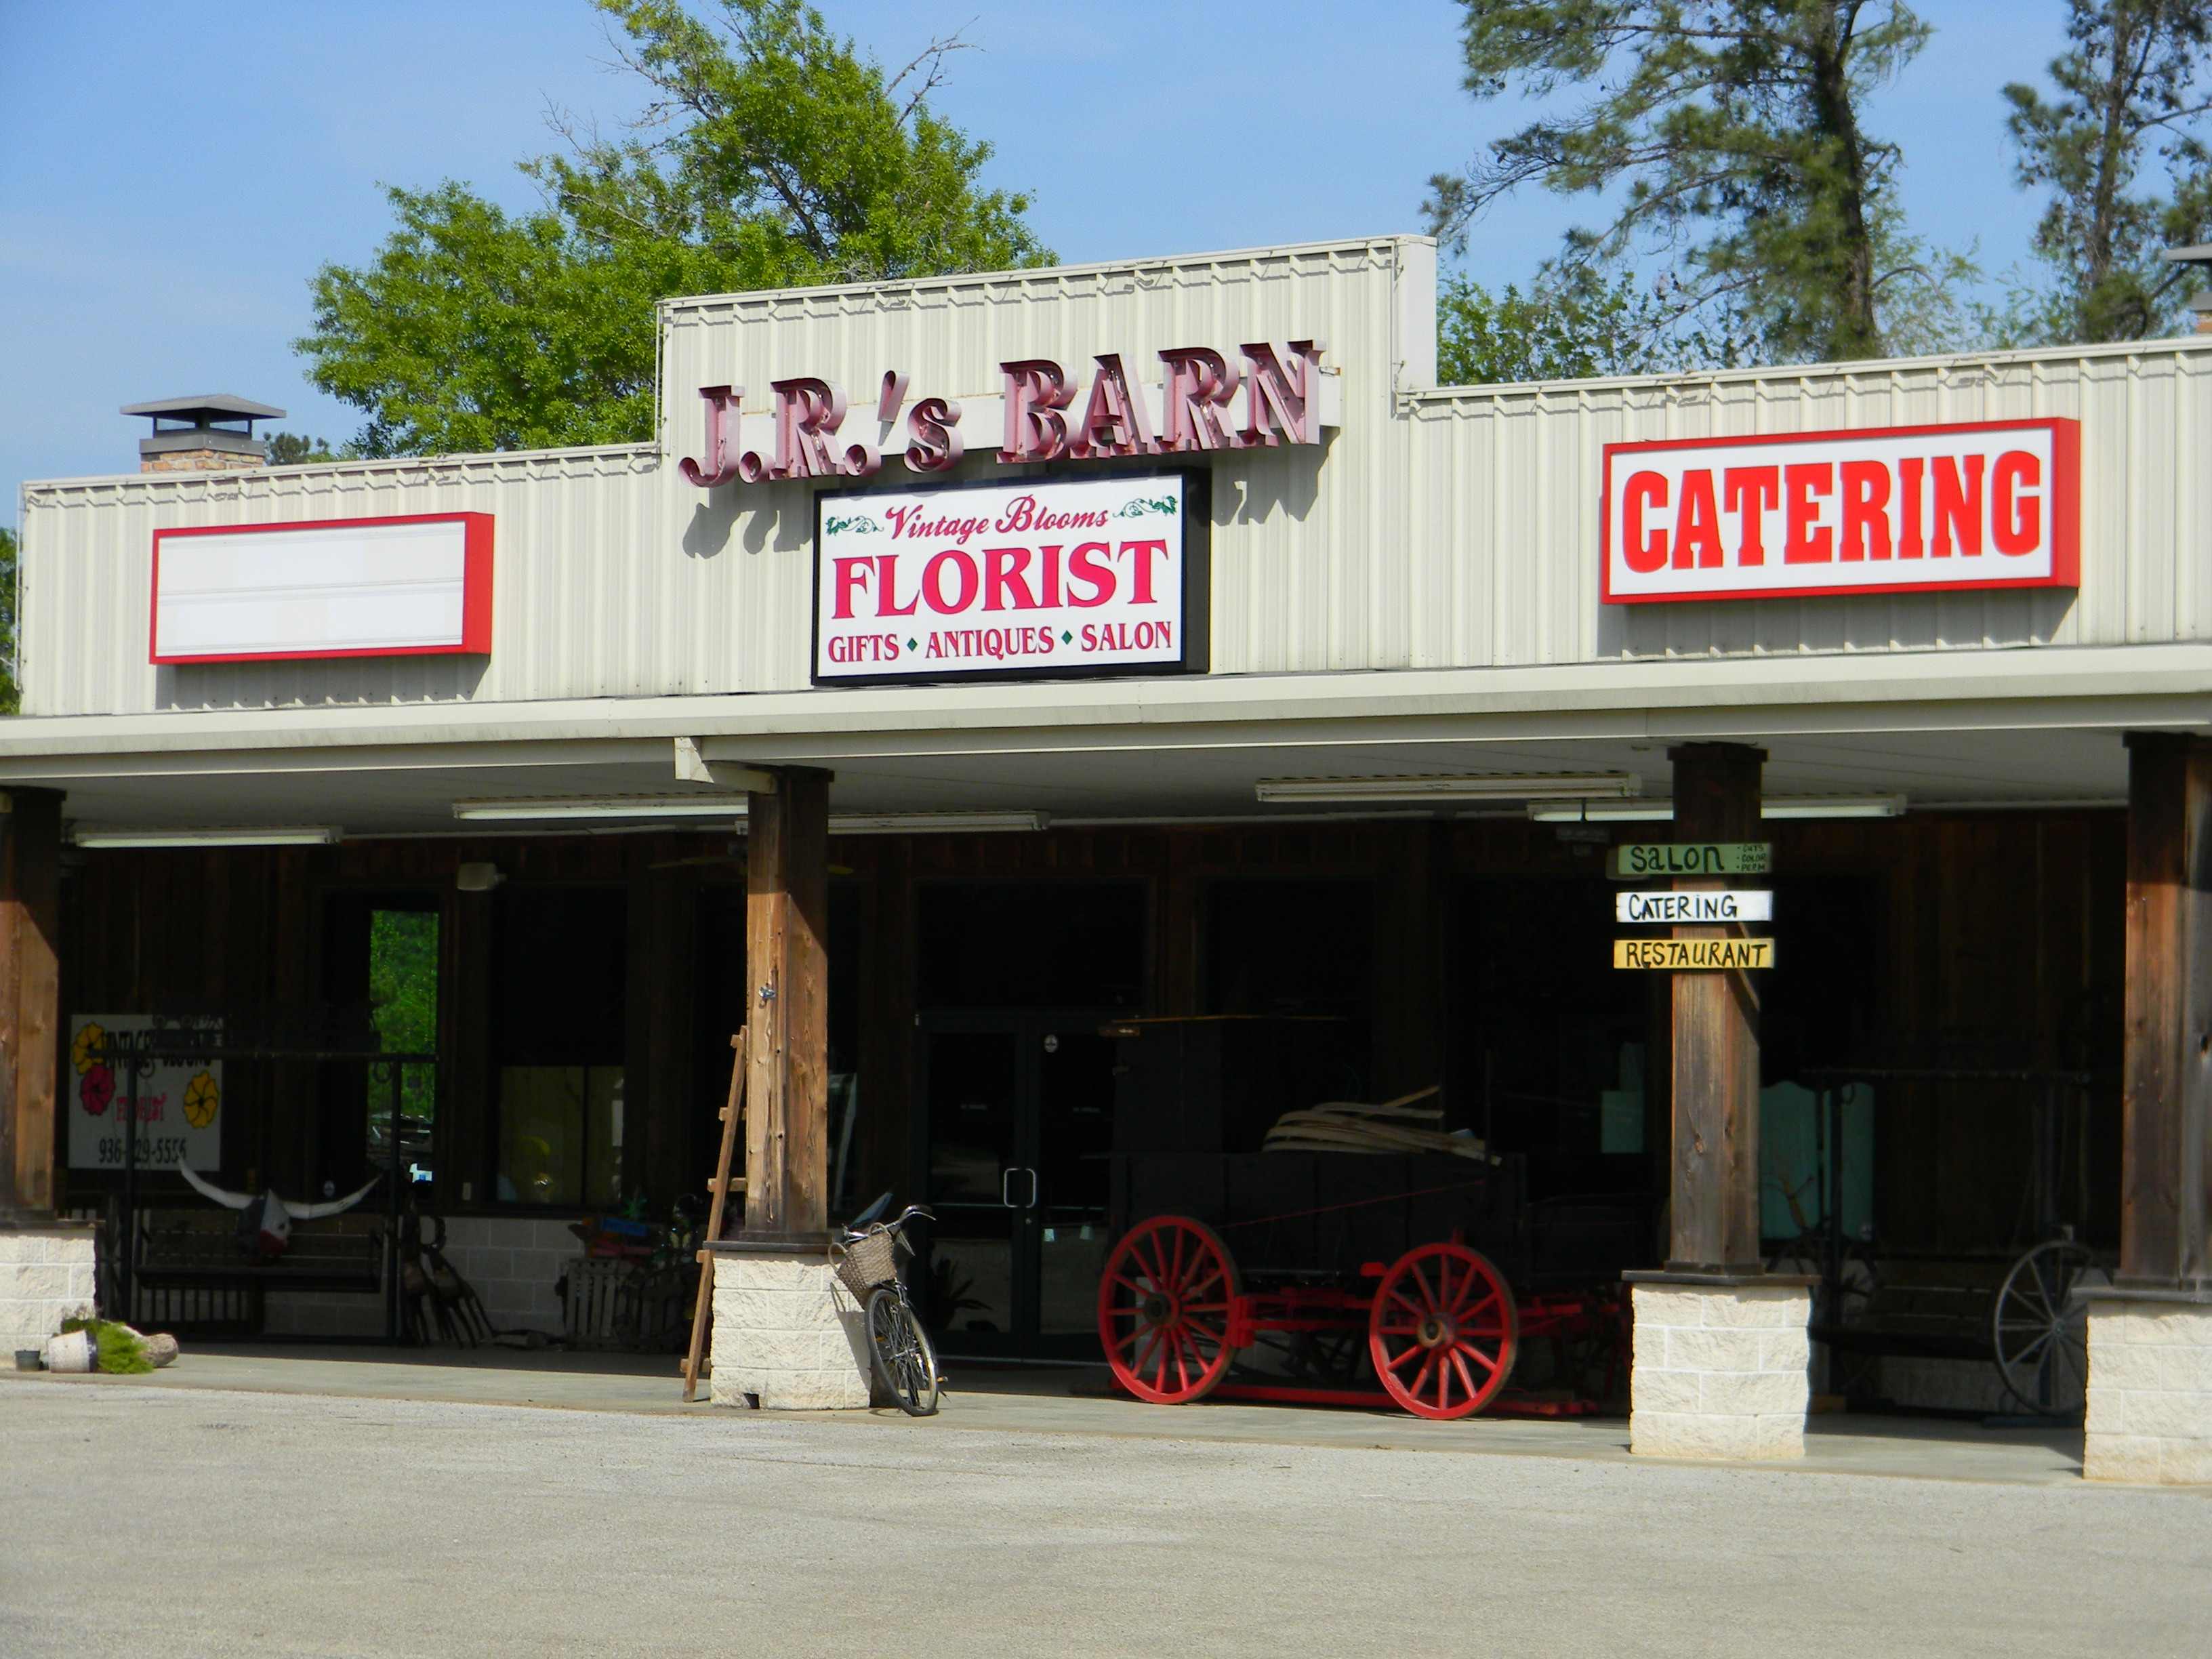 jrs-barn-front-close